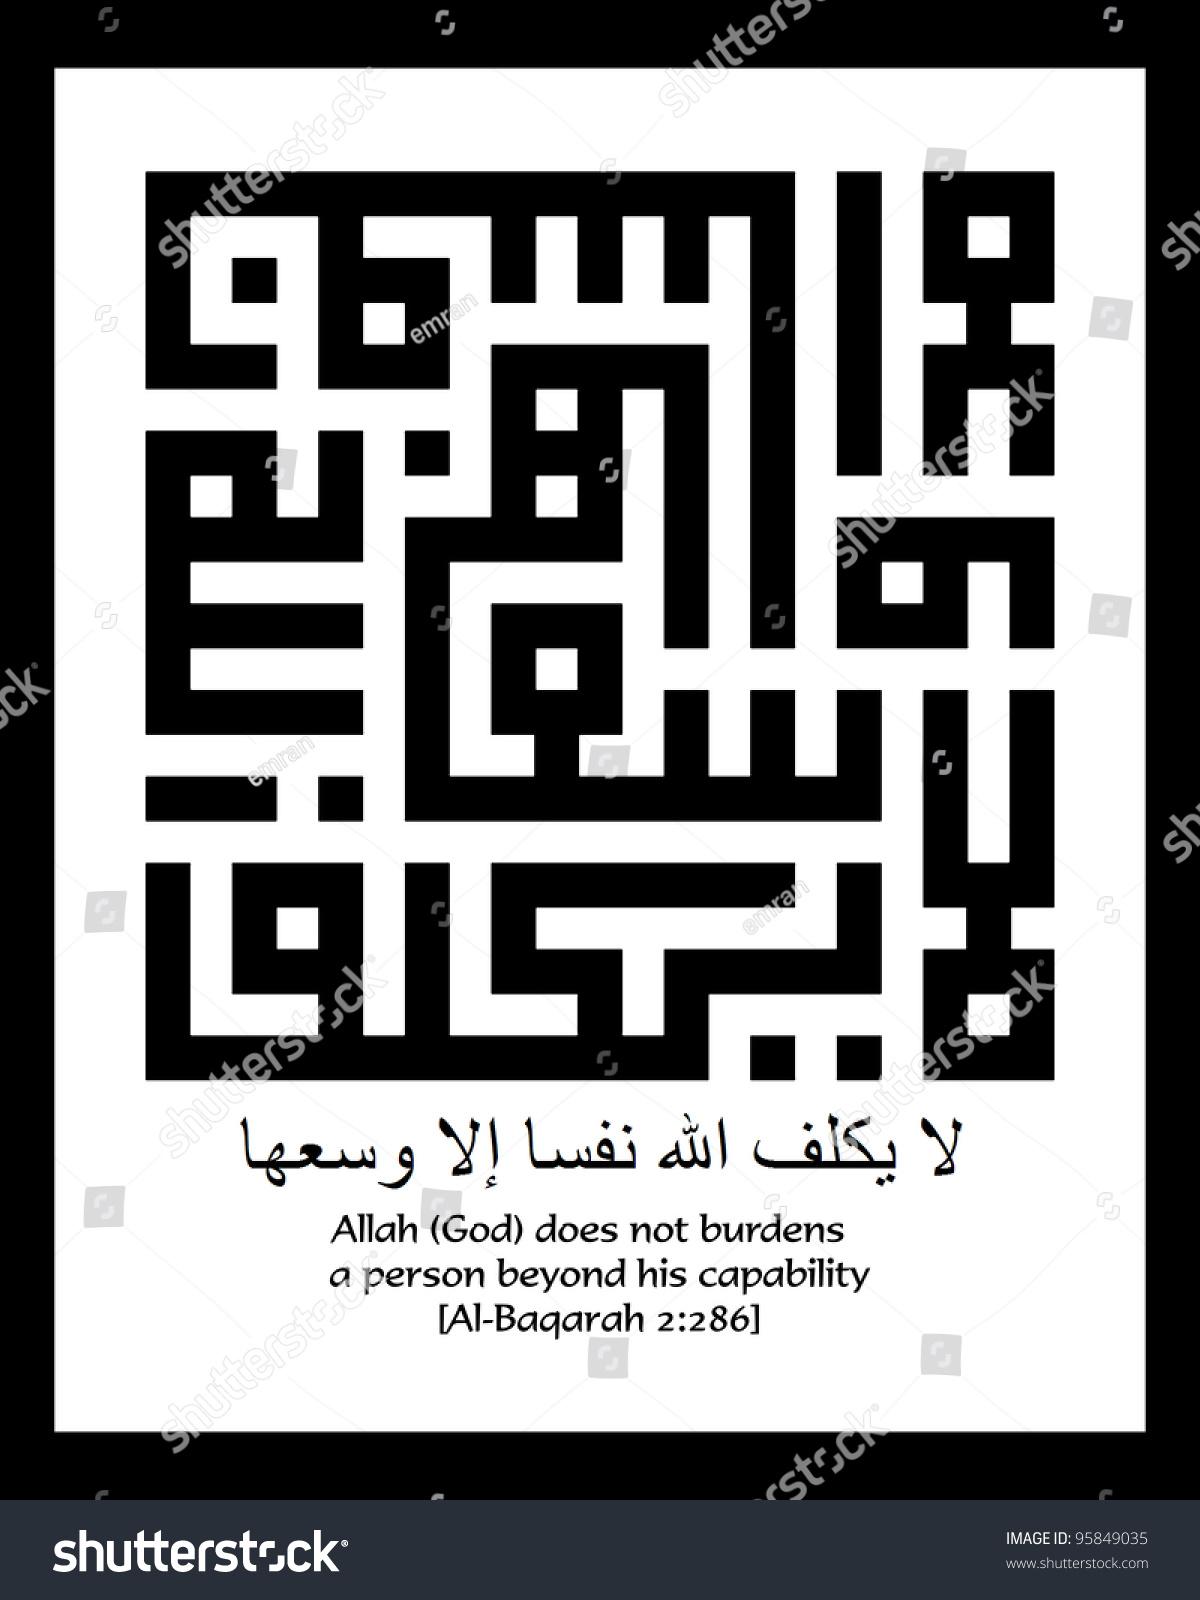 A kufi square kufic murabba arabic calligraphy version